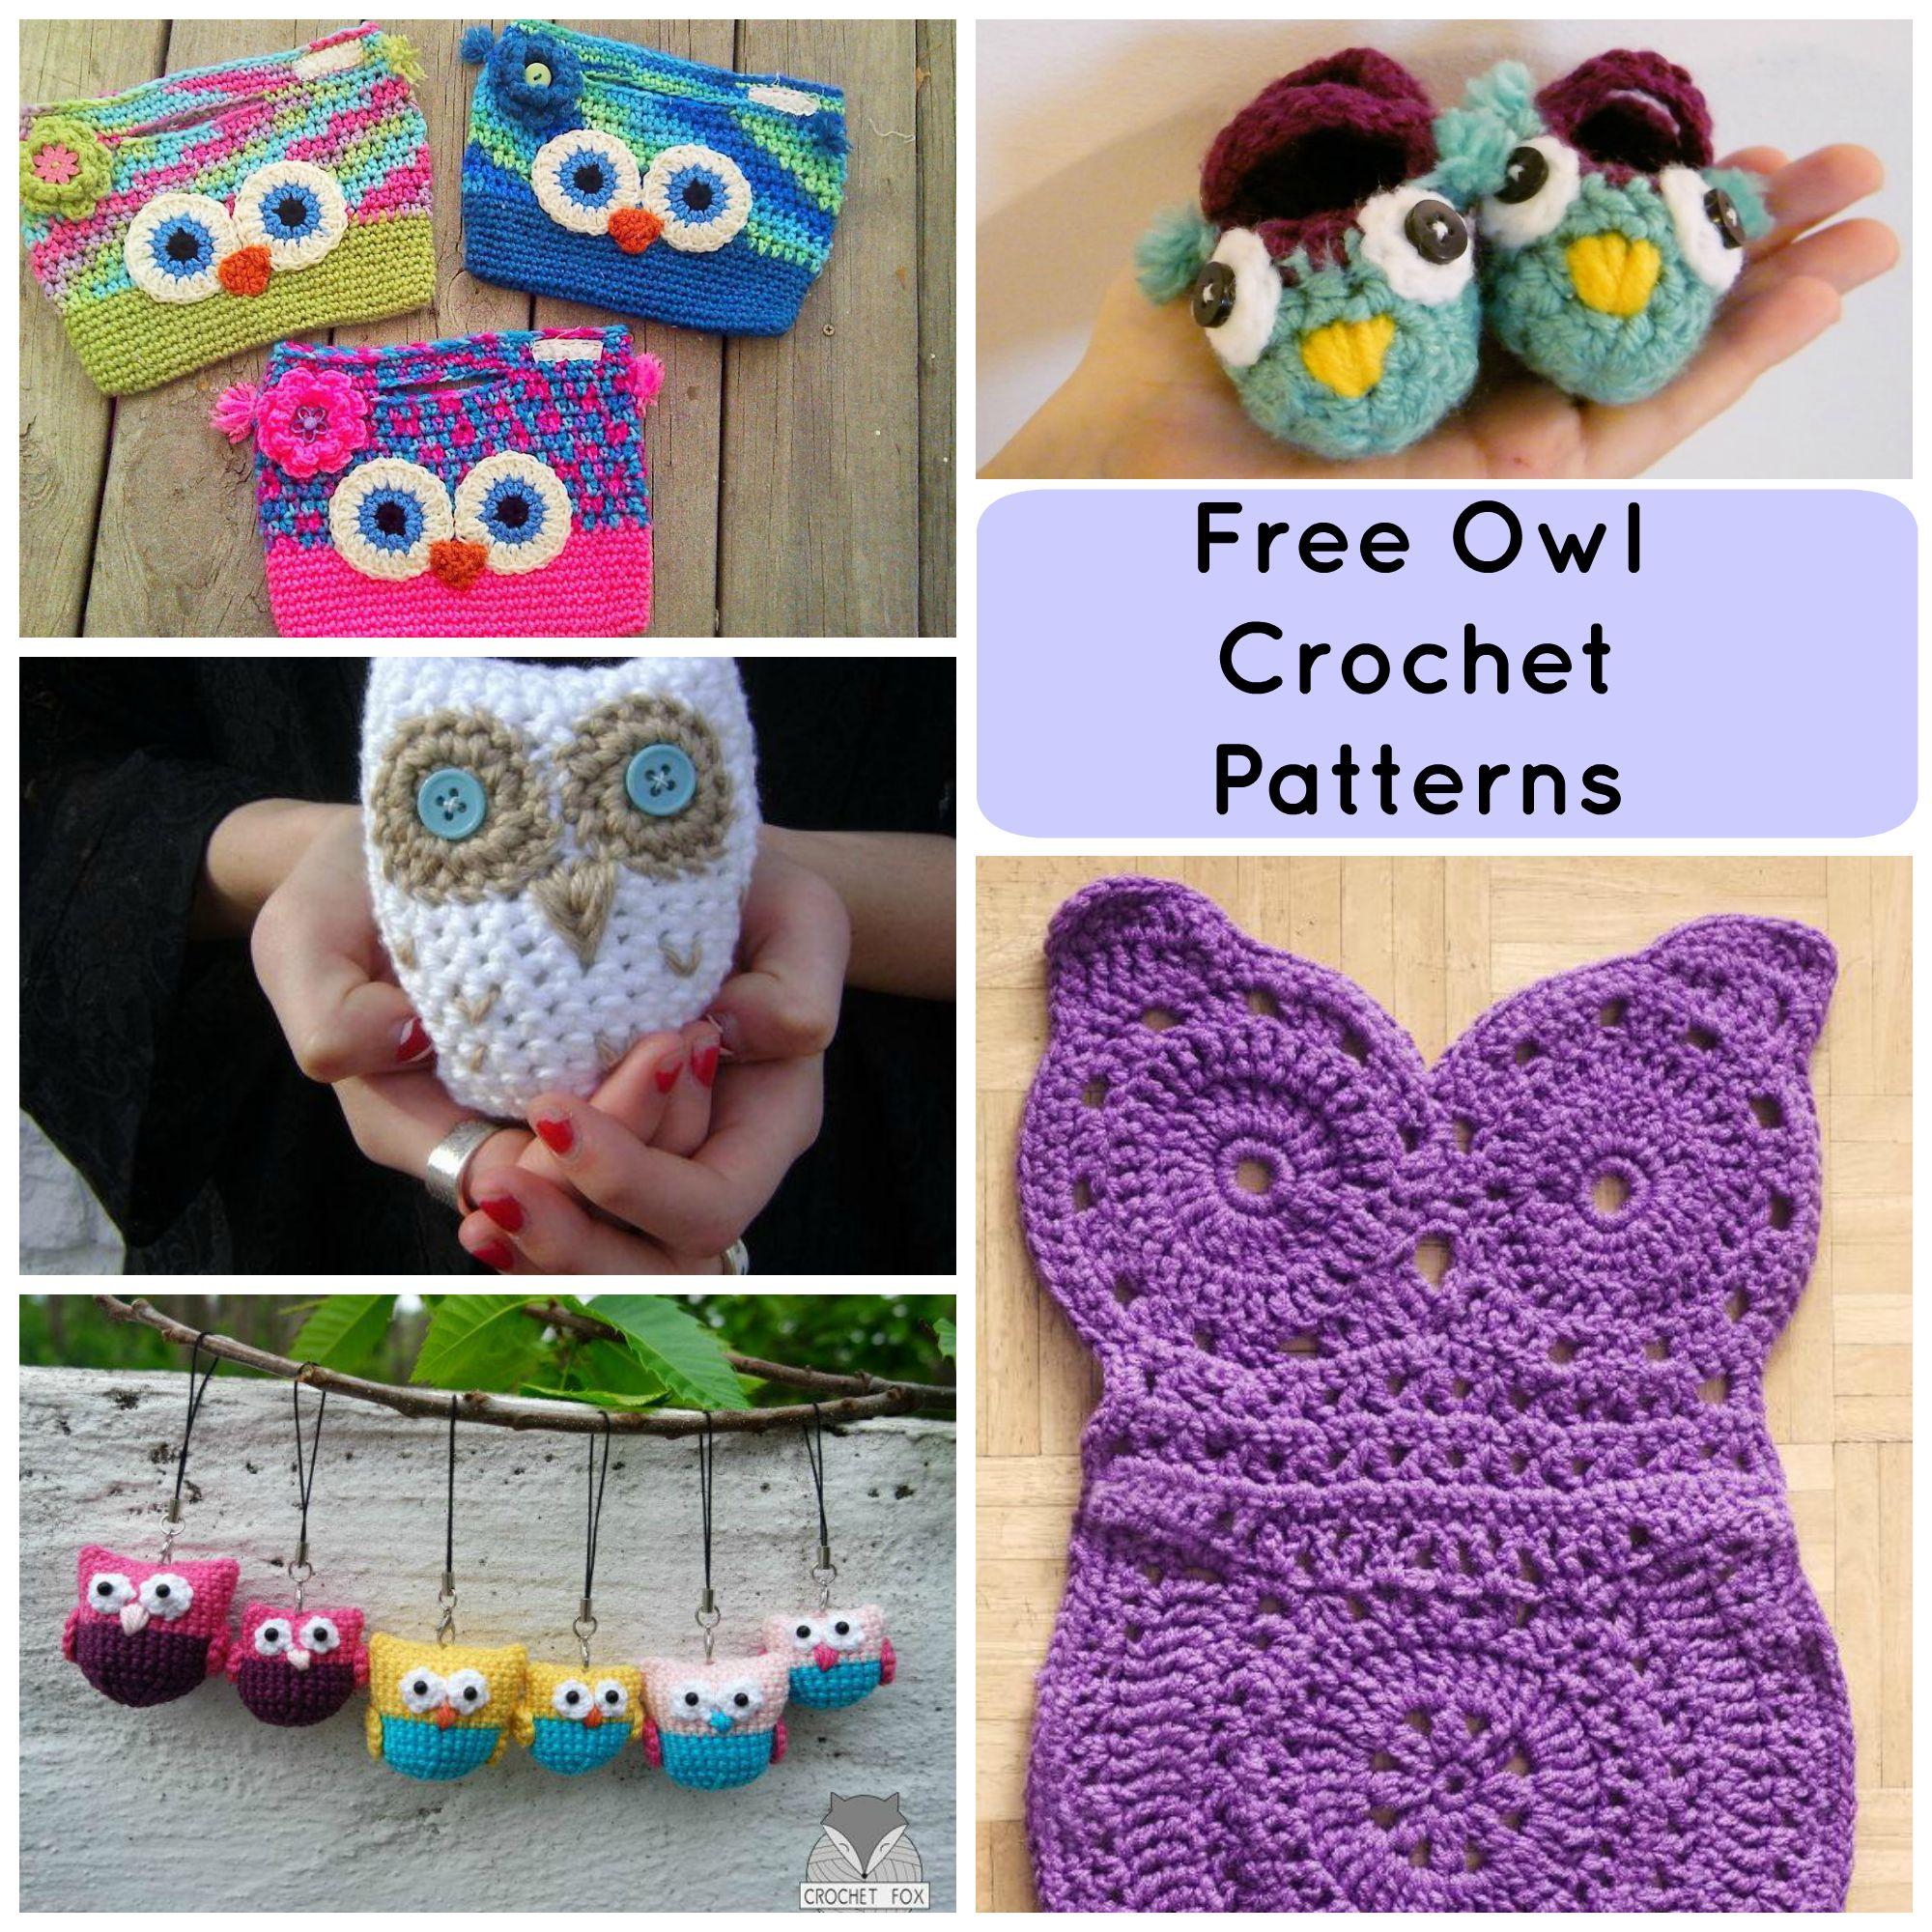 Crochet owl pattern 7 hoot-worthy free crochet owl patterns dypqbvl